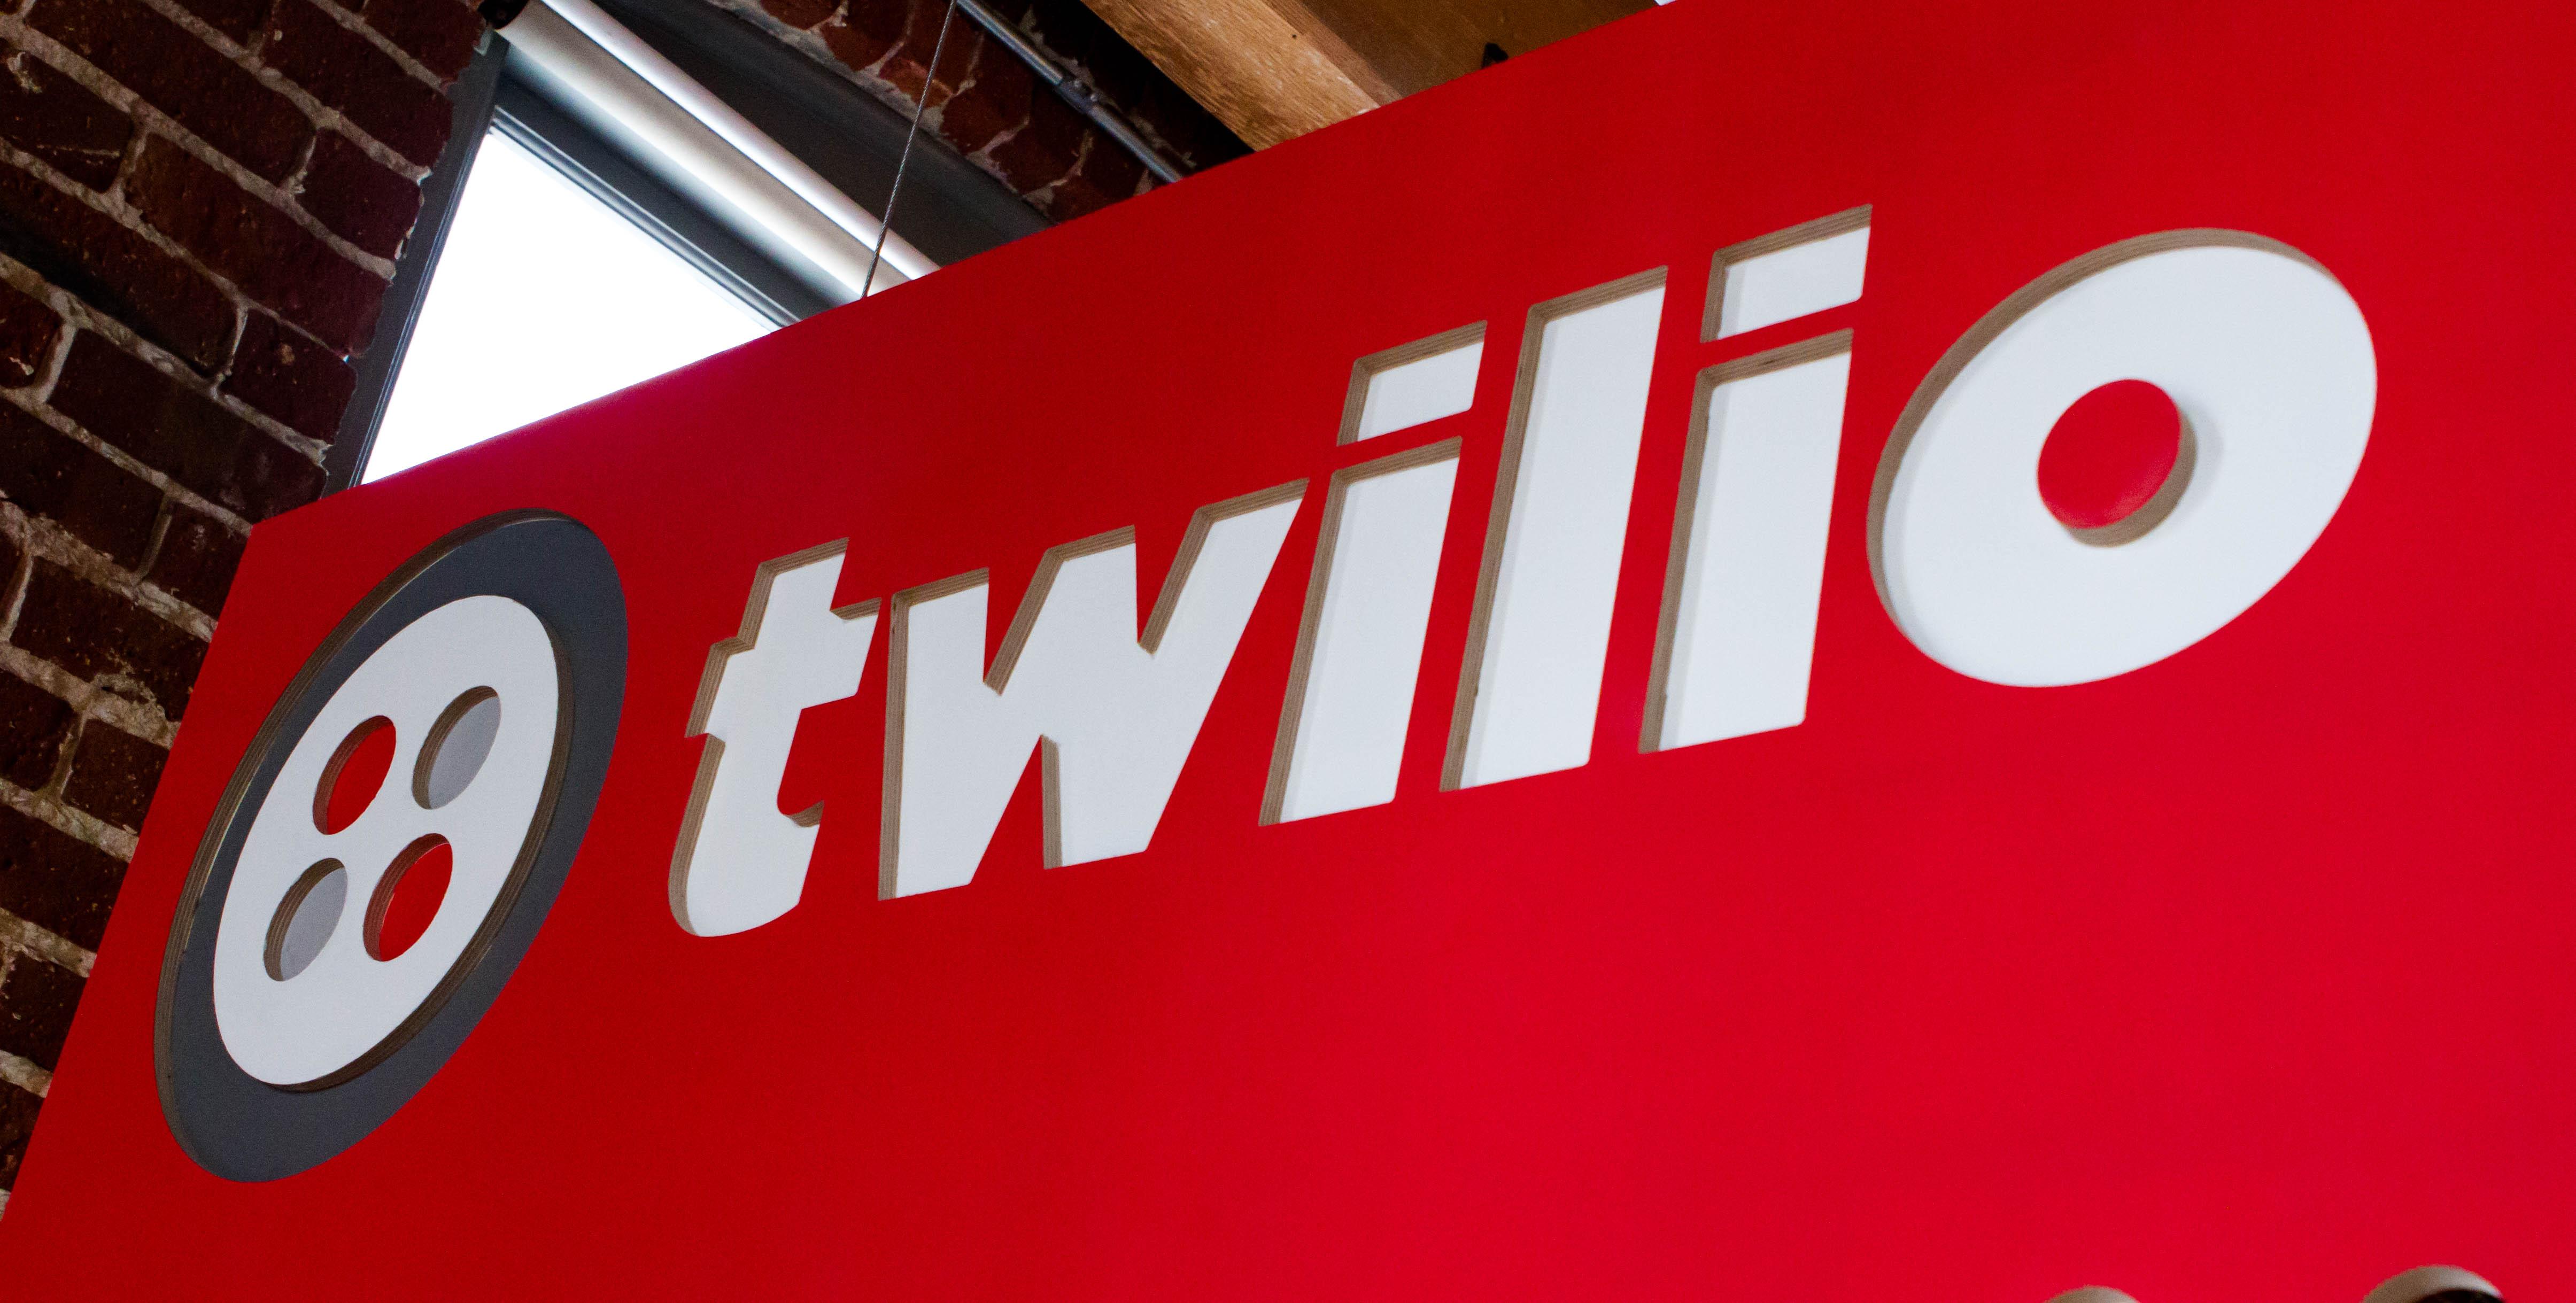 Twilio to acquire email technology firm SendGrid in $2 billion deal |  VentureBeat